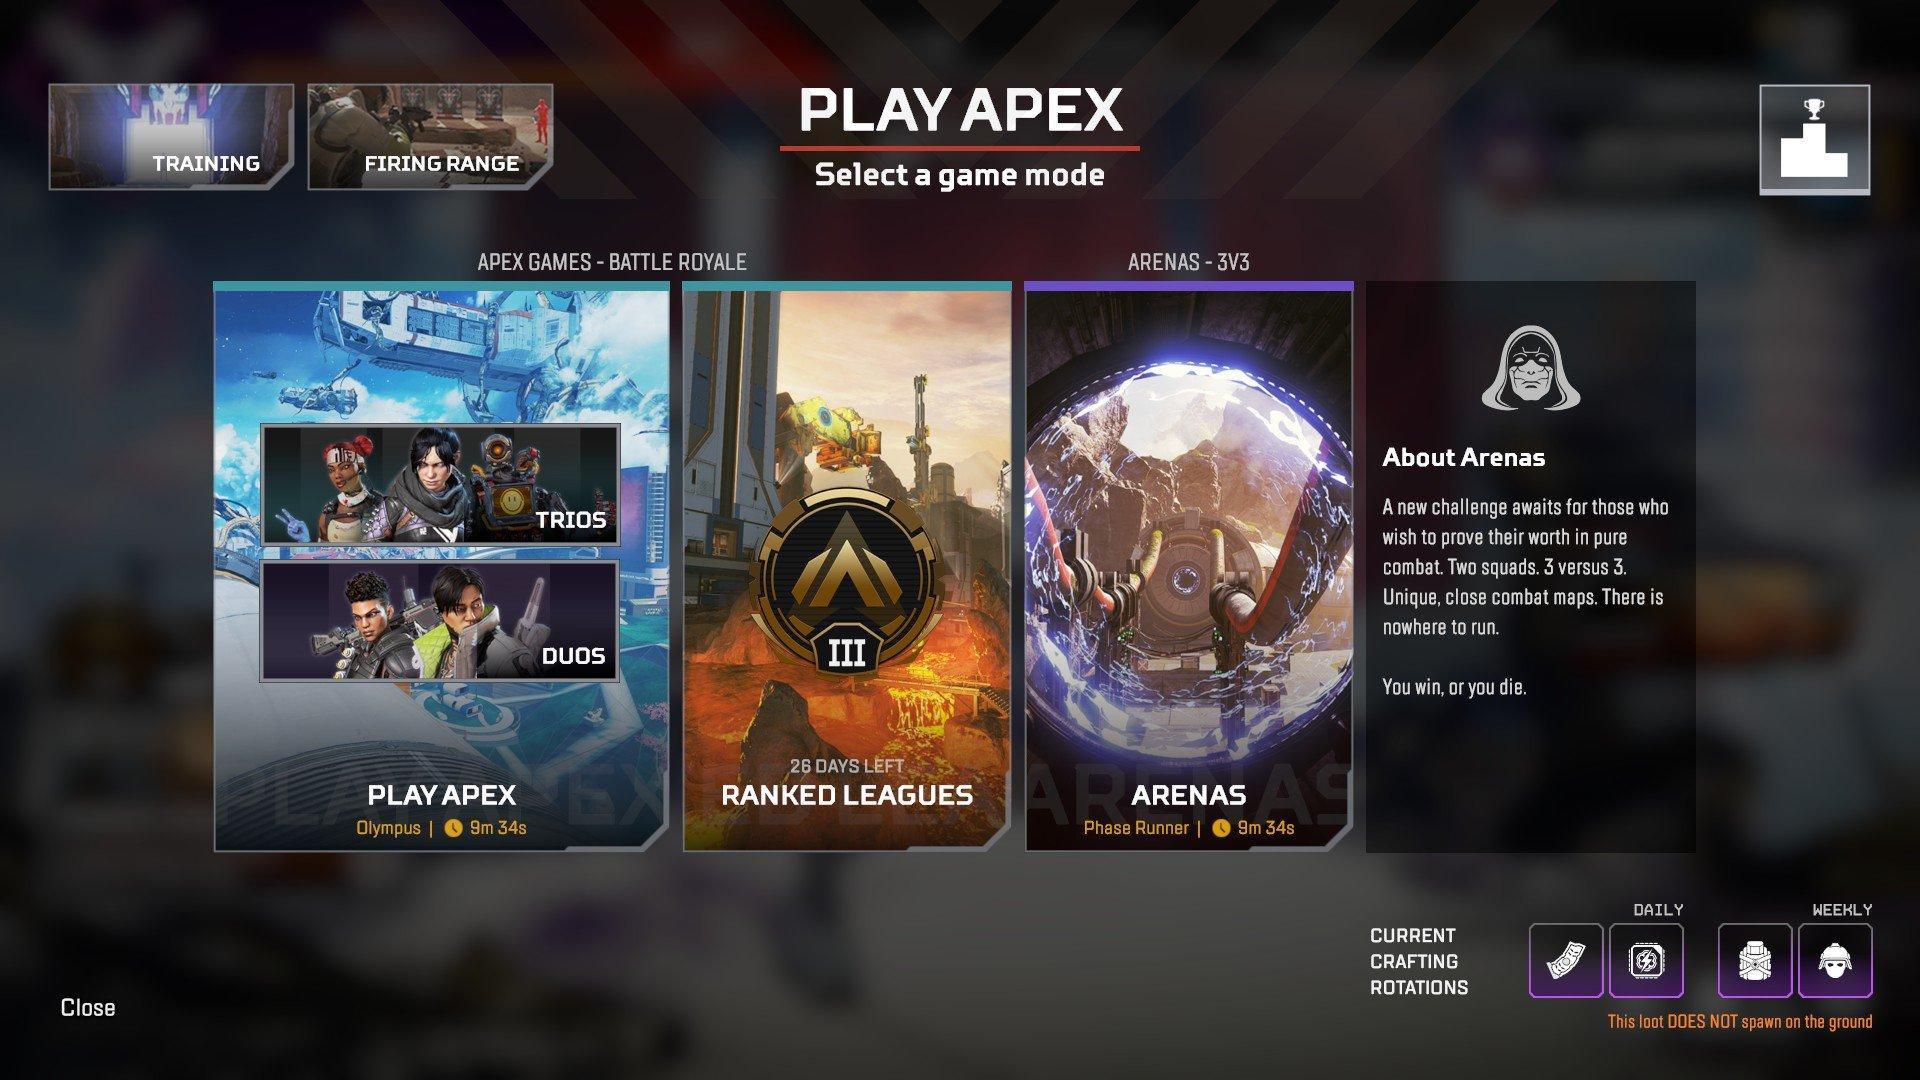 Apex Legends - Game Modes Ranked